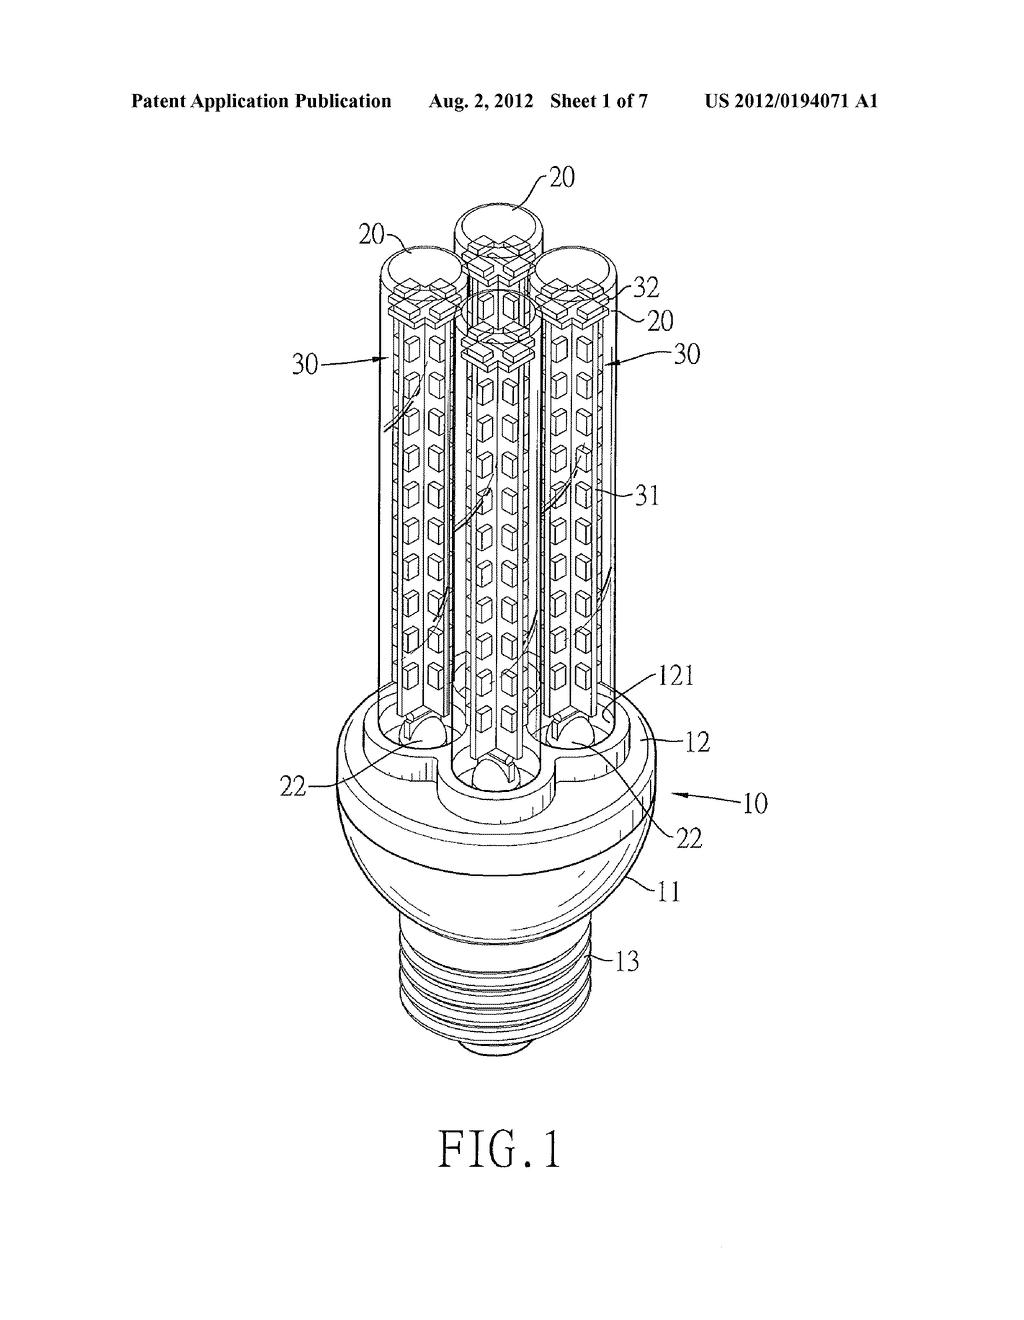 multi tubular led light bulb diagram schematic and image 02 rh patentsencyclopedia com led lamps diagram led lamps diagram